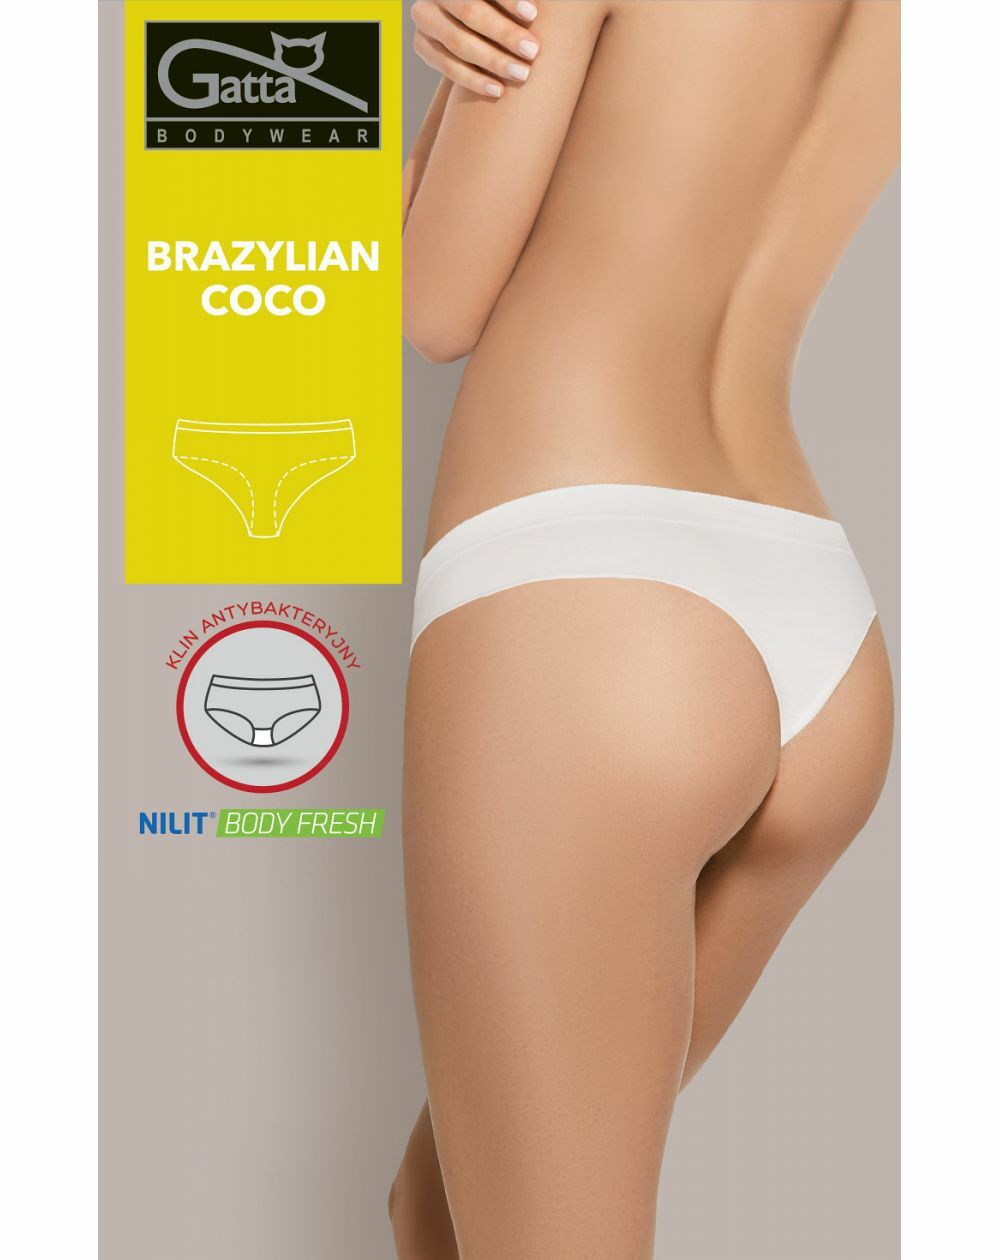 Figi Gatta 41606S Brazylian Coco